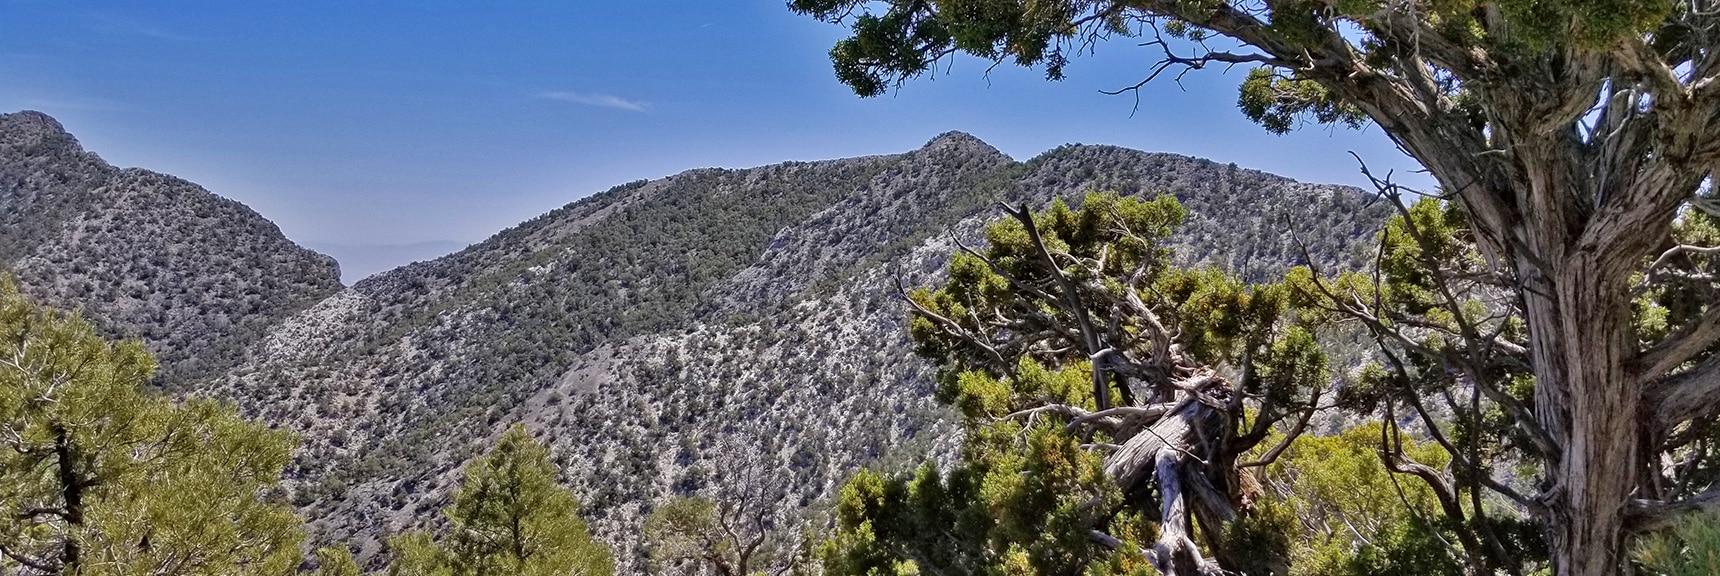 El Padre Mountain | La Madre Mountains Wilderness, Nevada